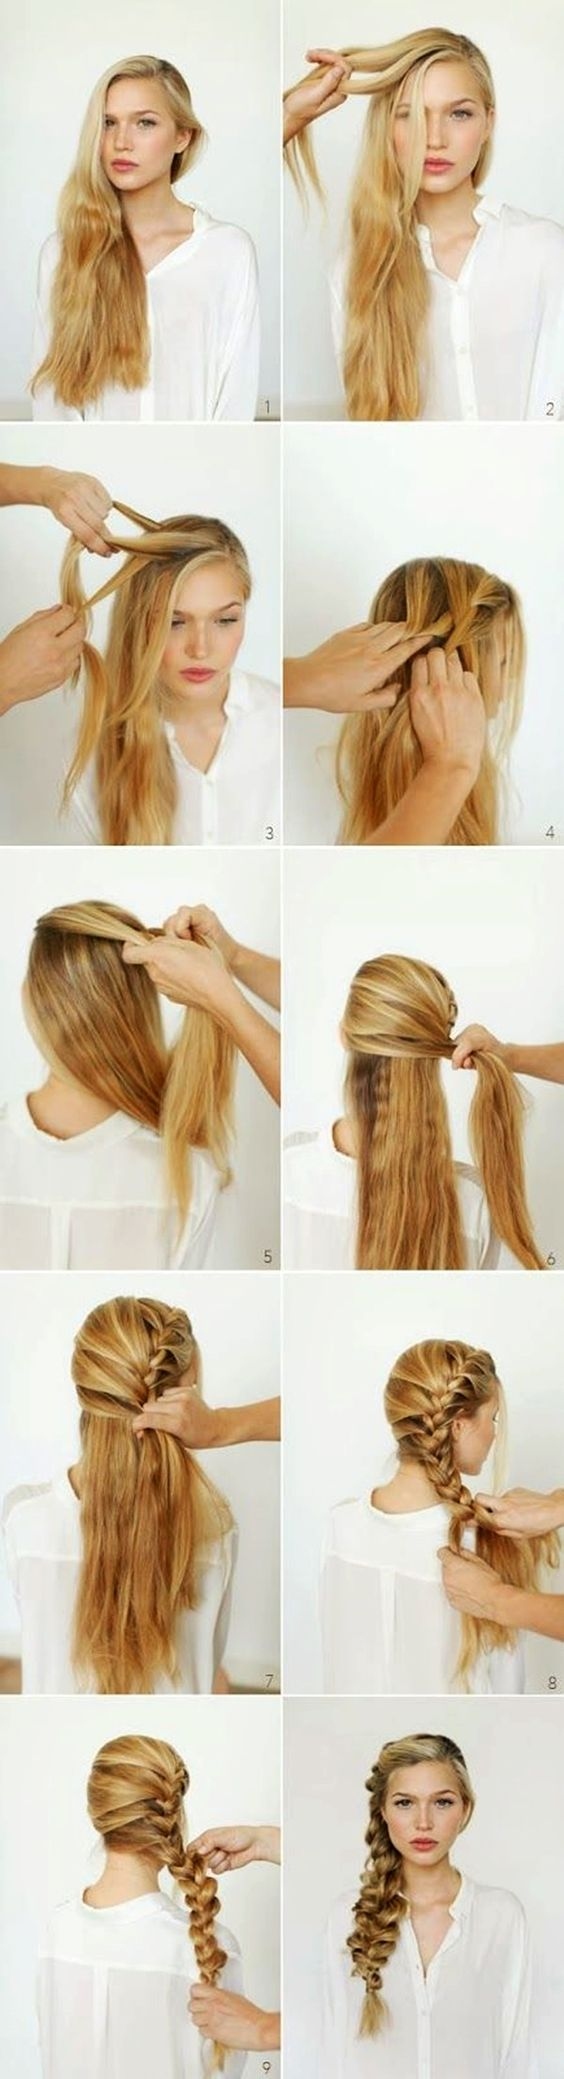 Tremendous My Hair Hairstyle Ideas And Long Hair On Pinterest Short Hairstyles Gunalazisus